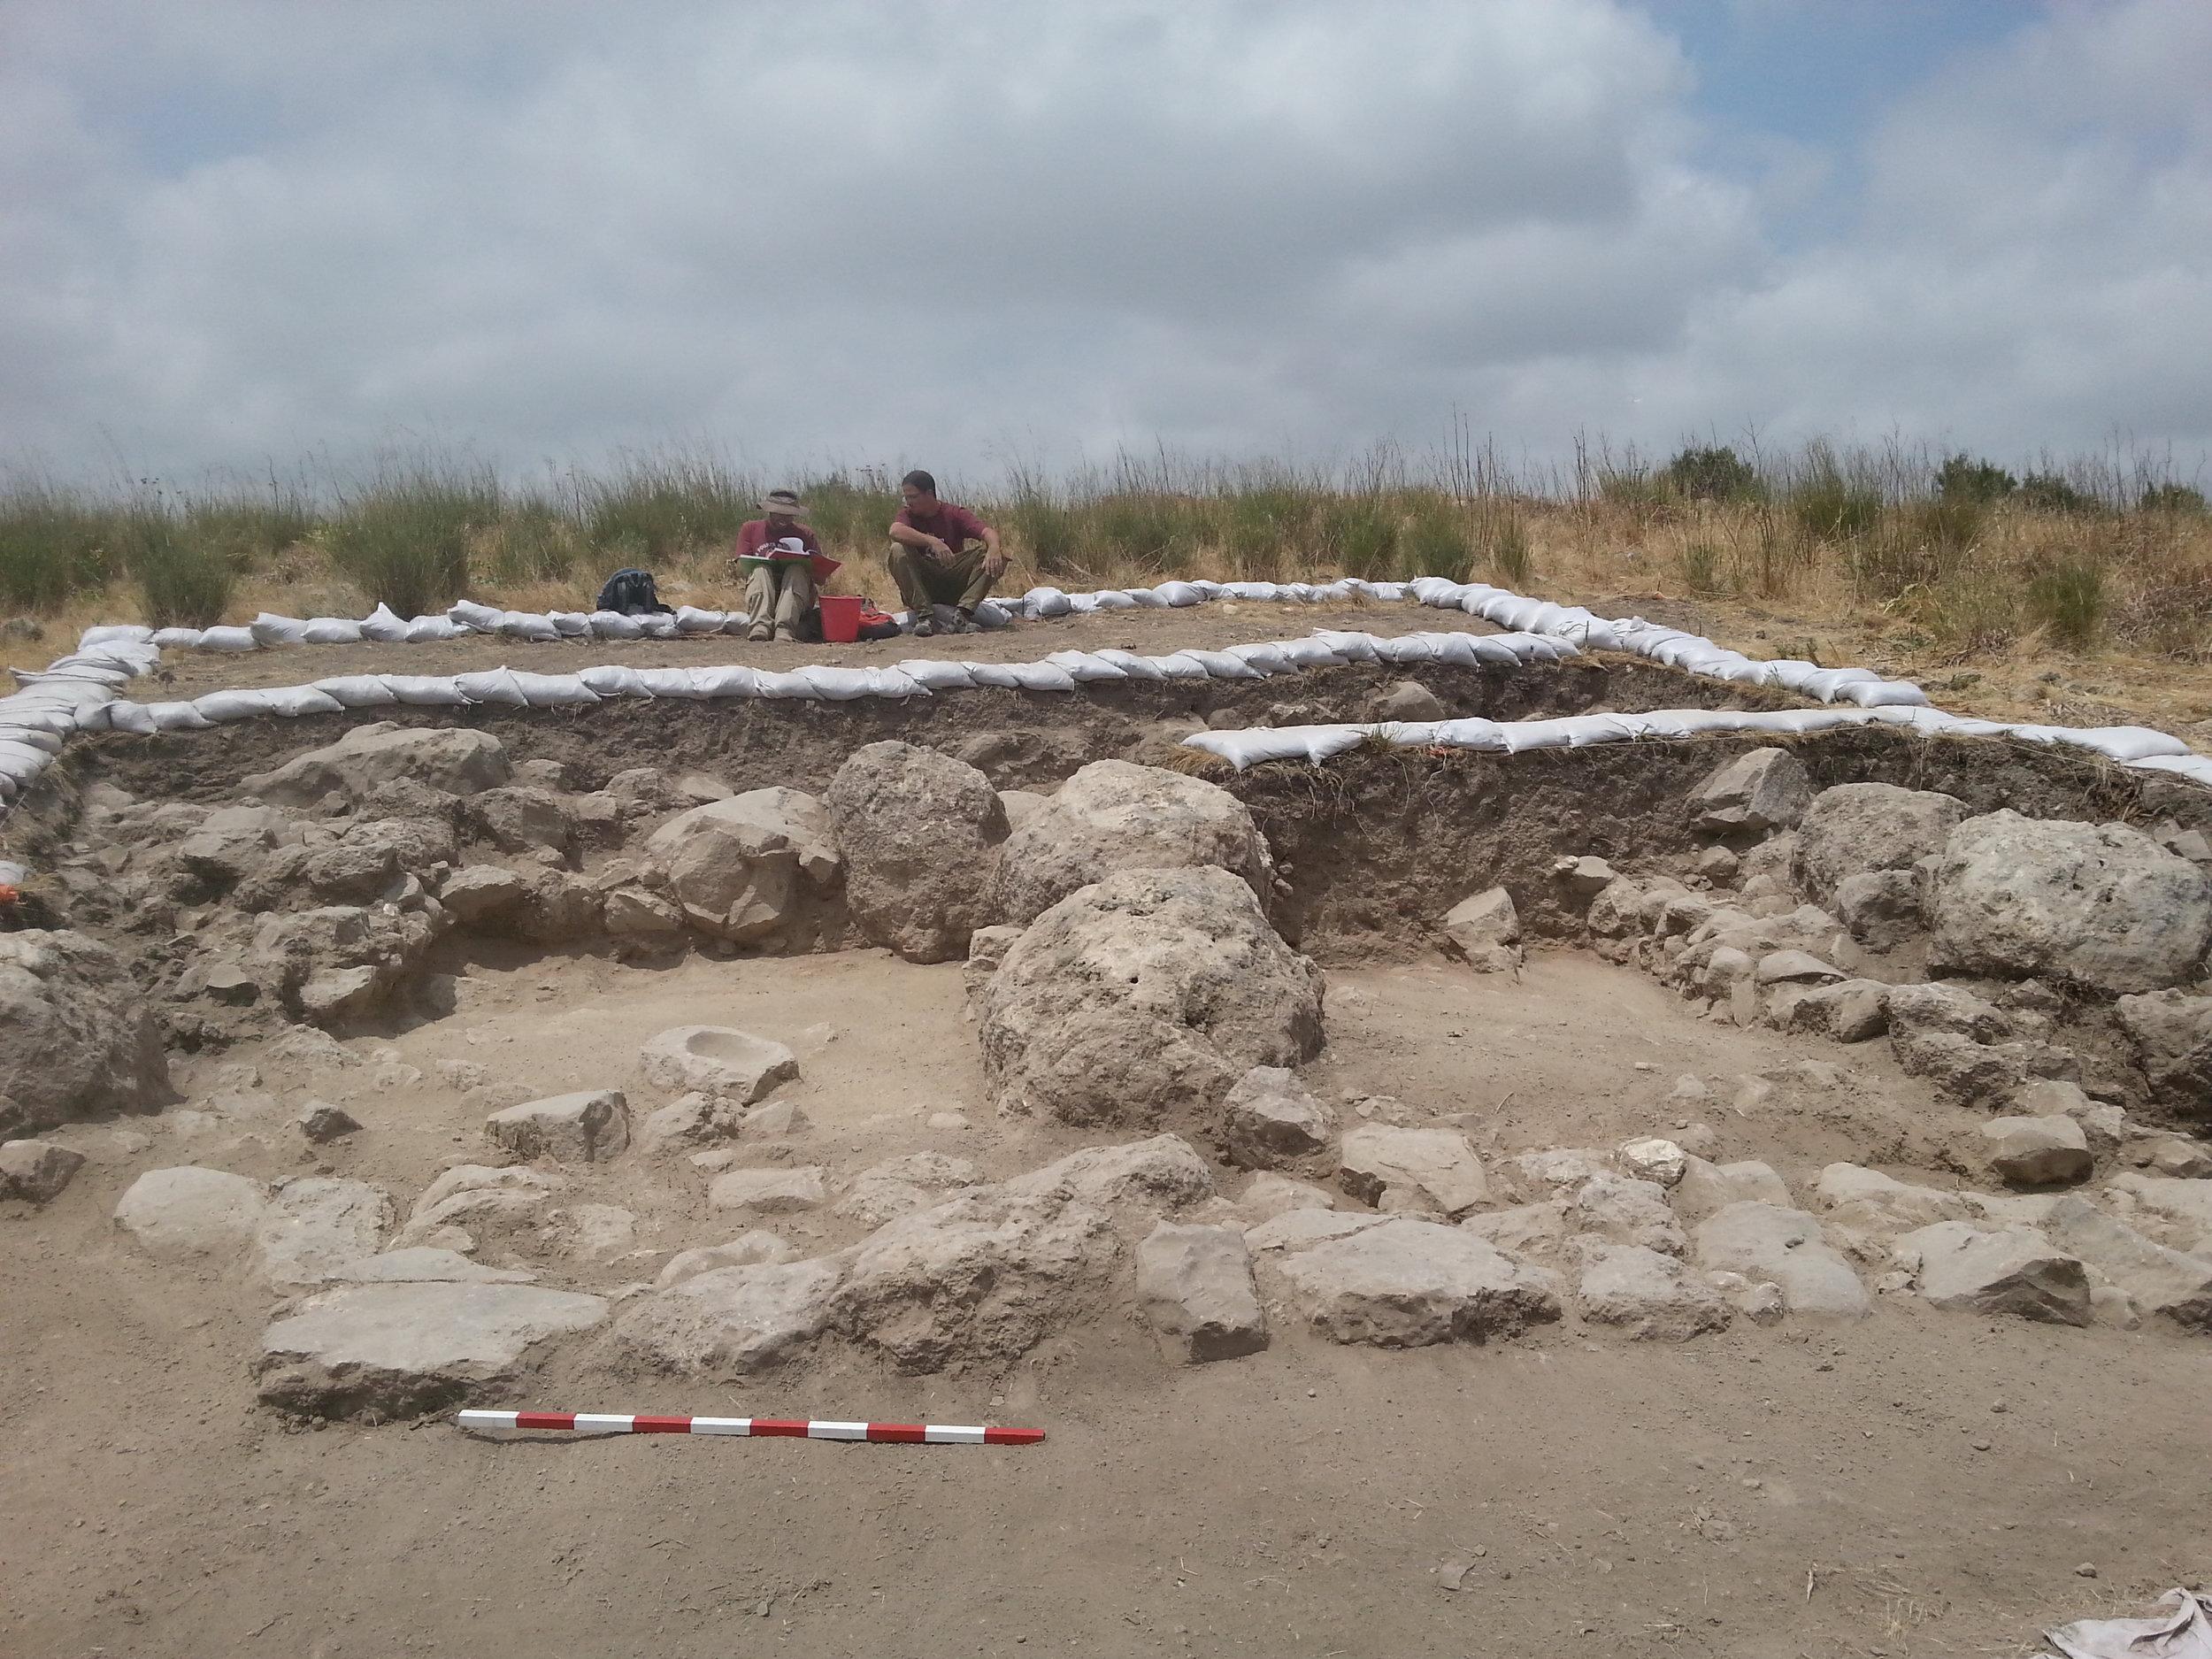 Courtesy, Excavation expedition to Khirbet al-Ra'i